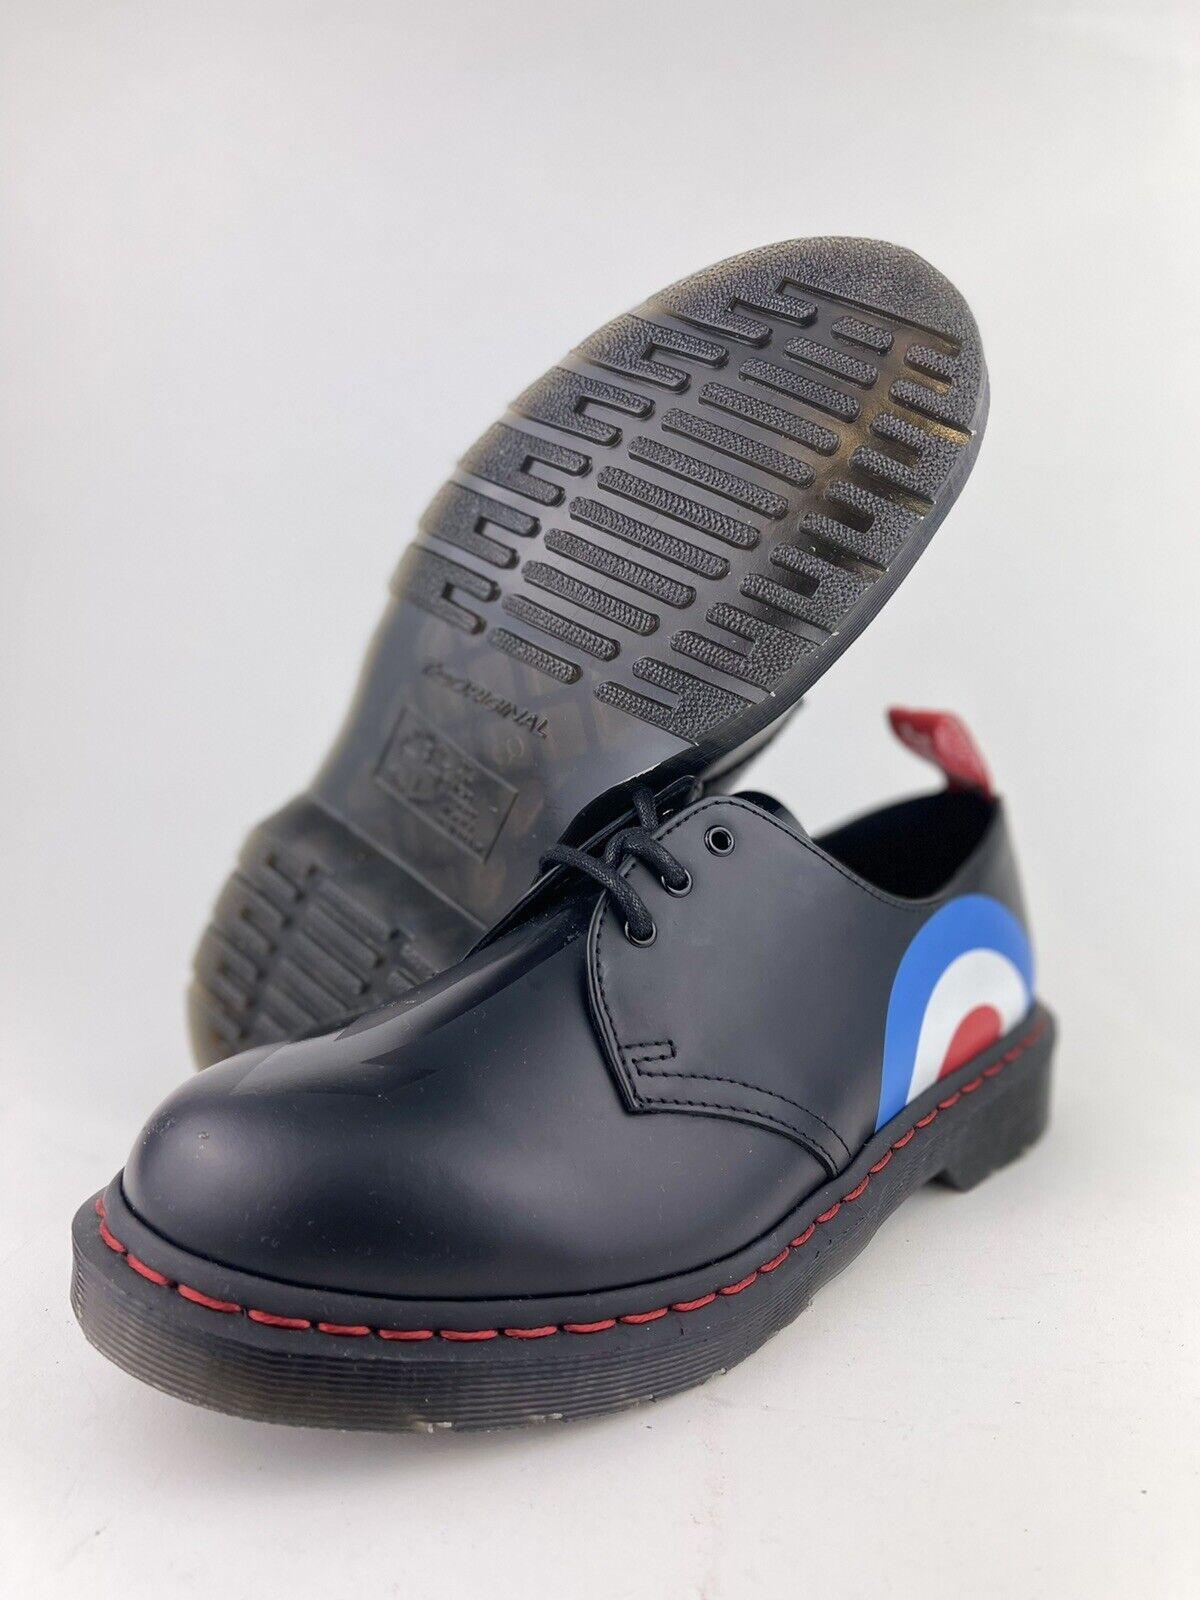 Dr Martens The Who Smooth Leather Platform Mens Shoes SZ 9 Black Target New 1461